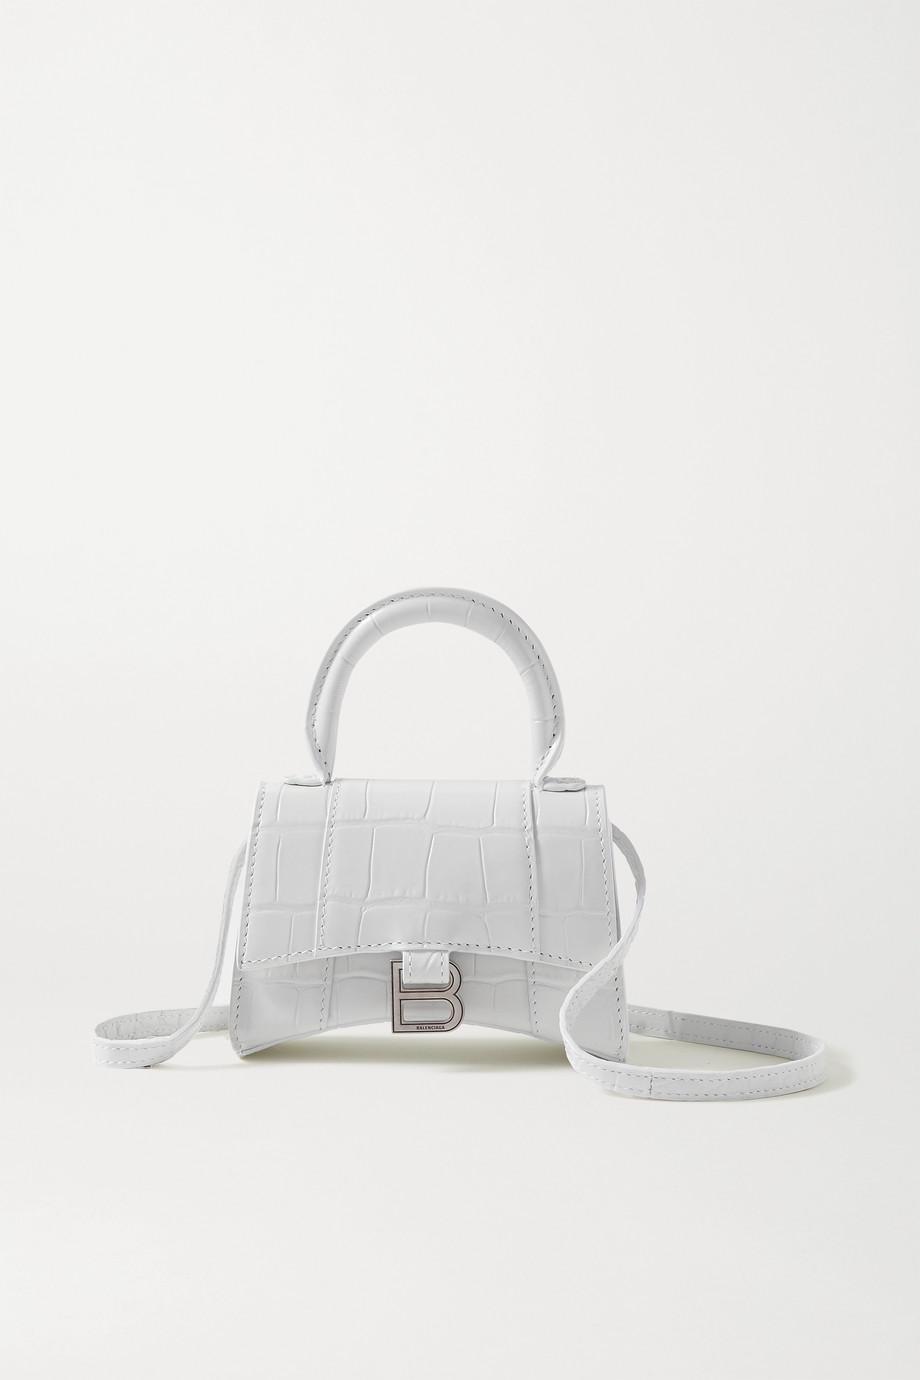 Balenciaga Hourglass nano croc-effect leather tote